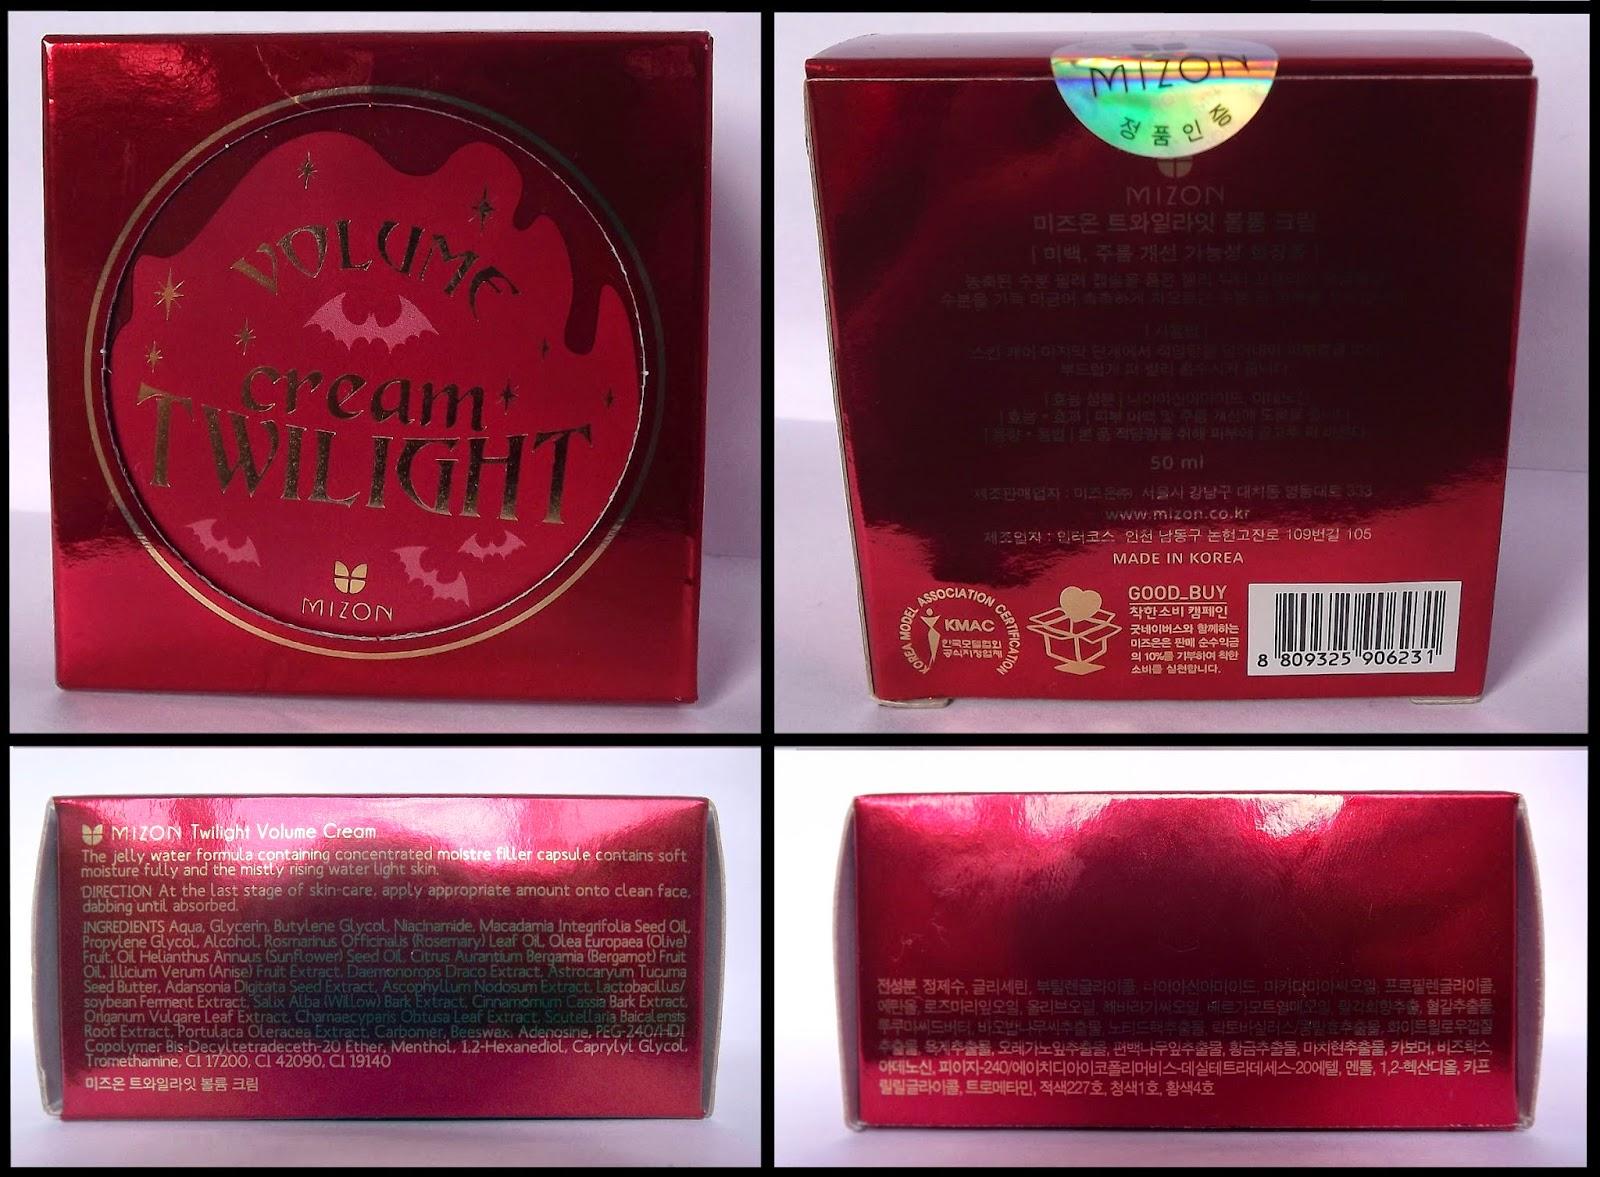 Mizon twilight voume cream box